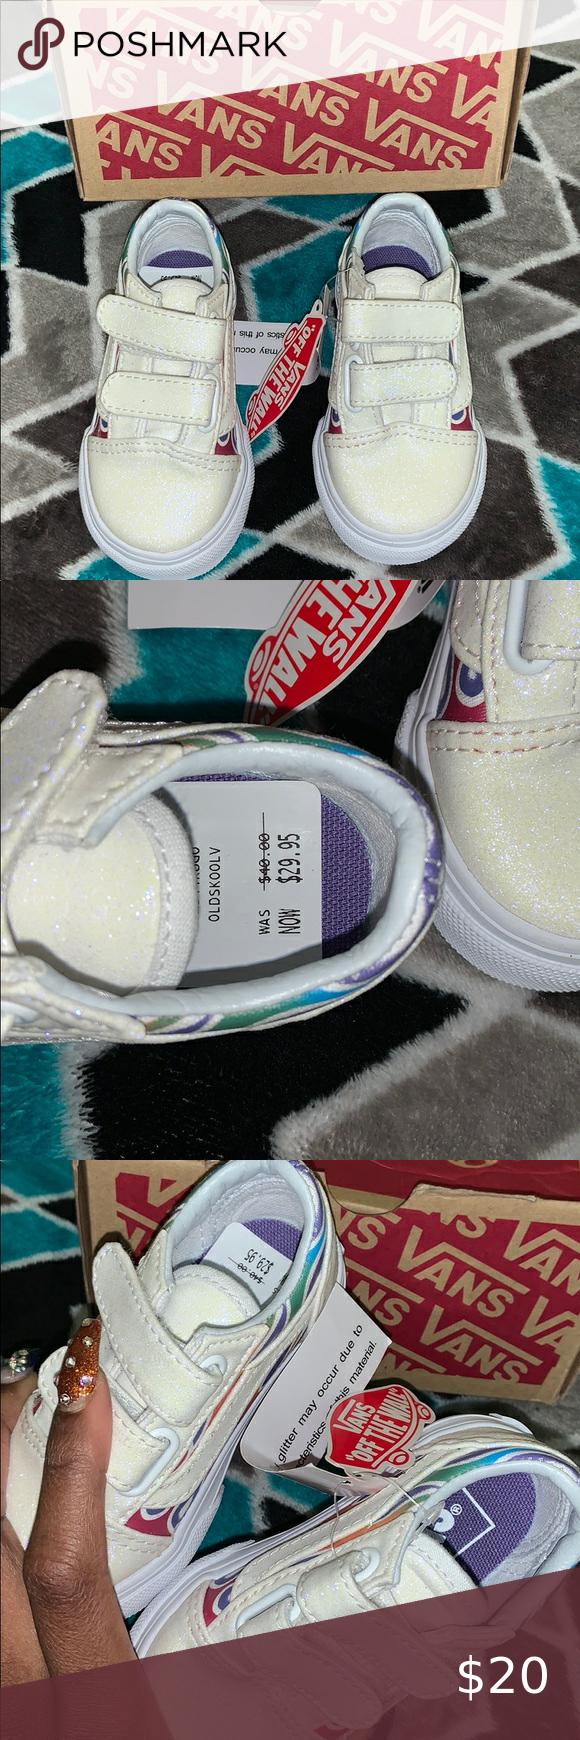 Vans 🌈 sparkle 🔥 Size 4.5 baby girl